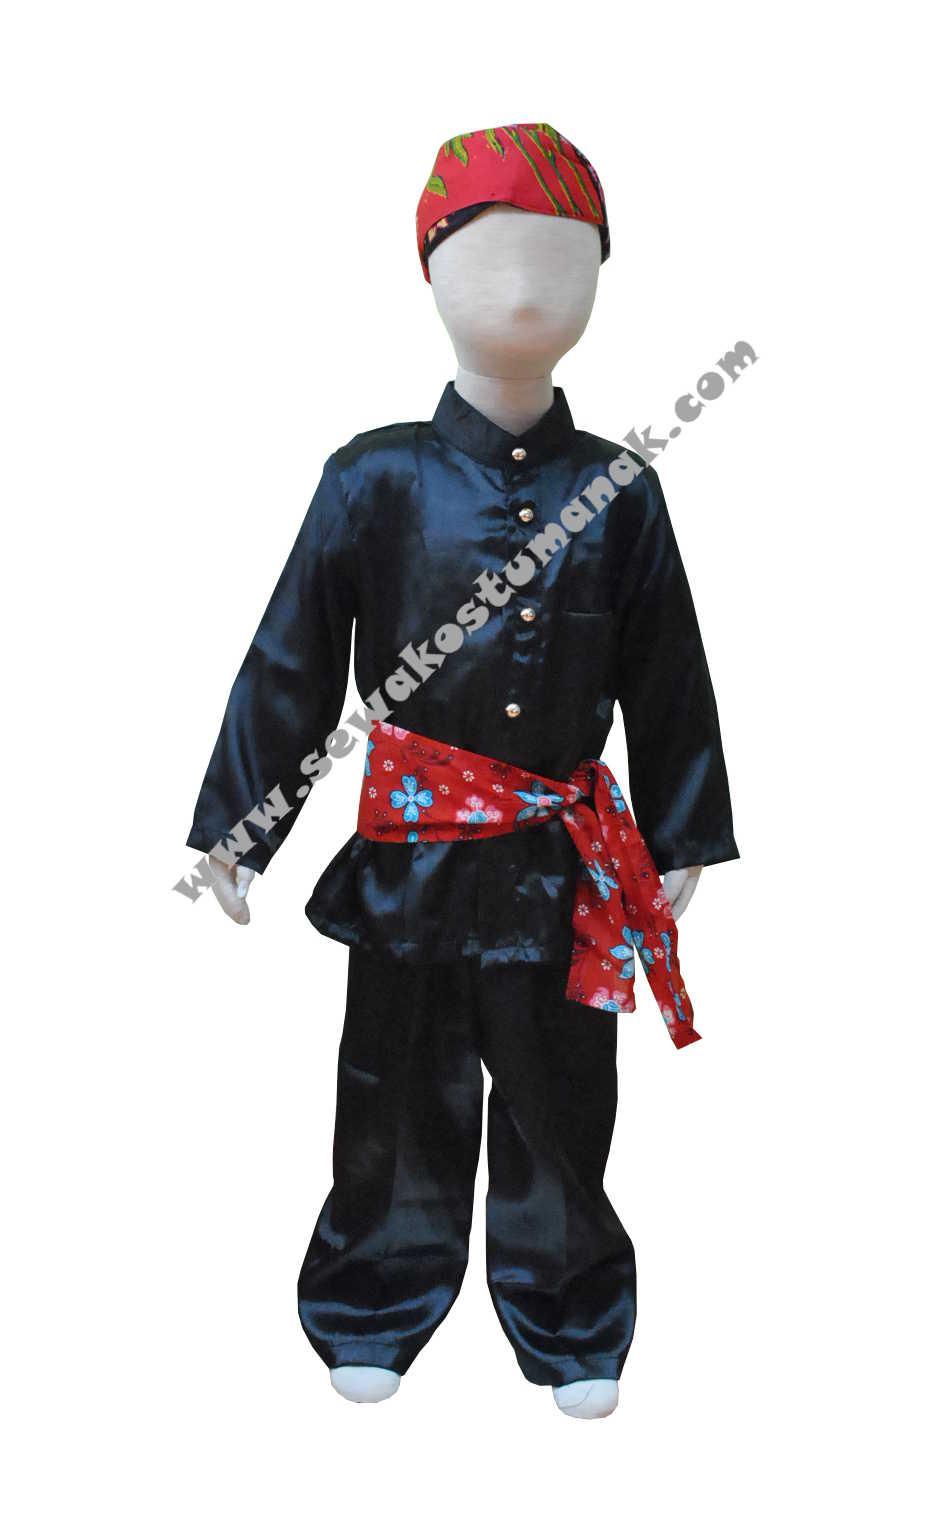 Pakaian Adat Betawi | Baju Adat Betawi | Sewa Kostum Anak